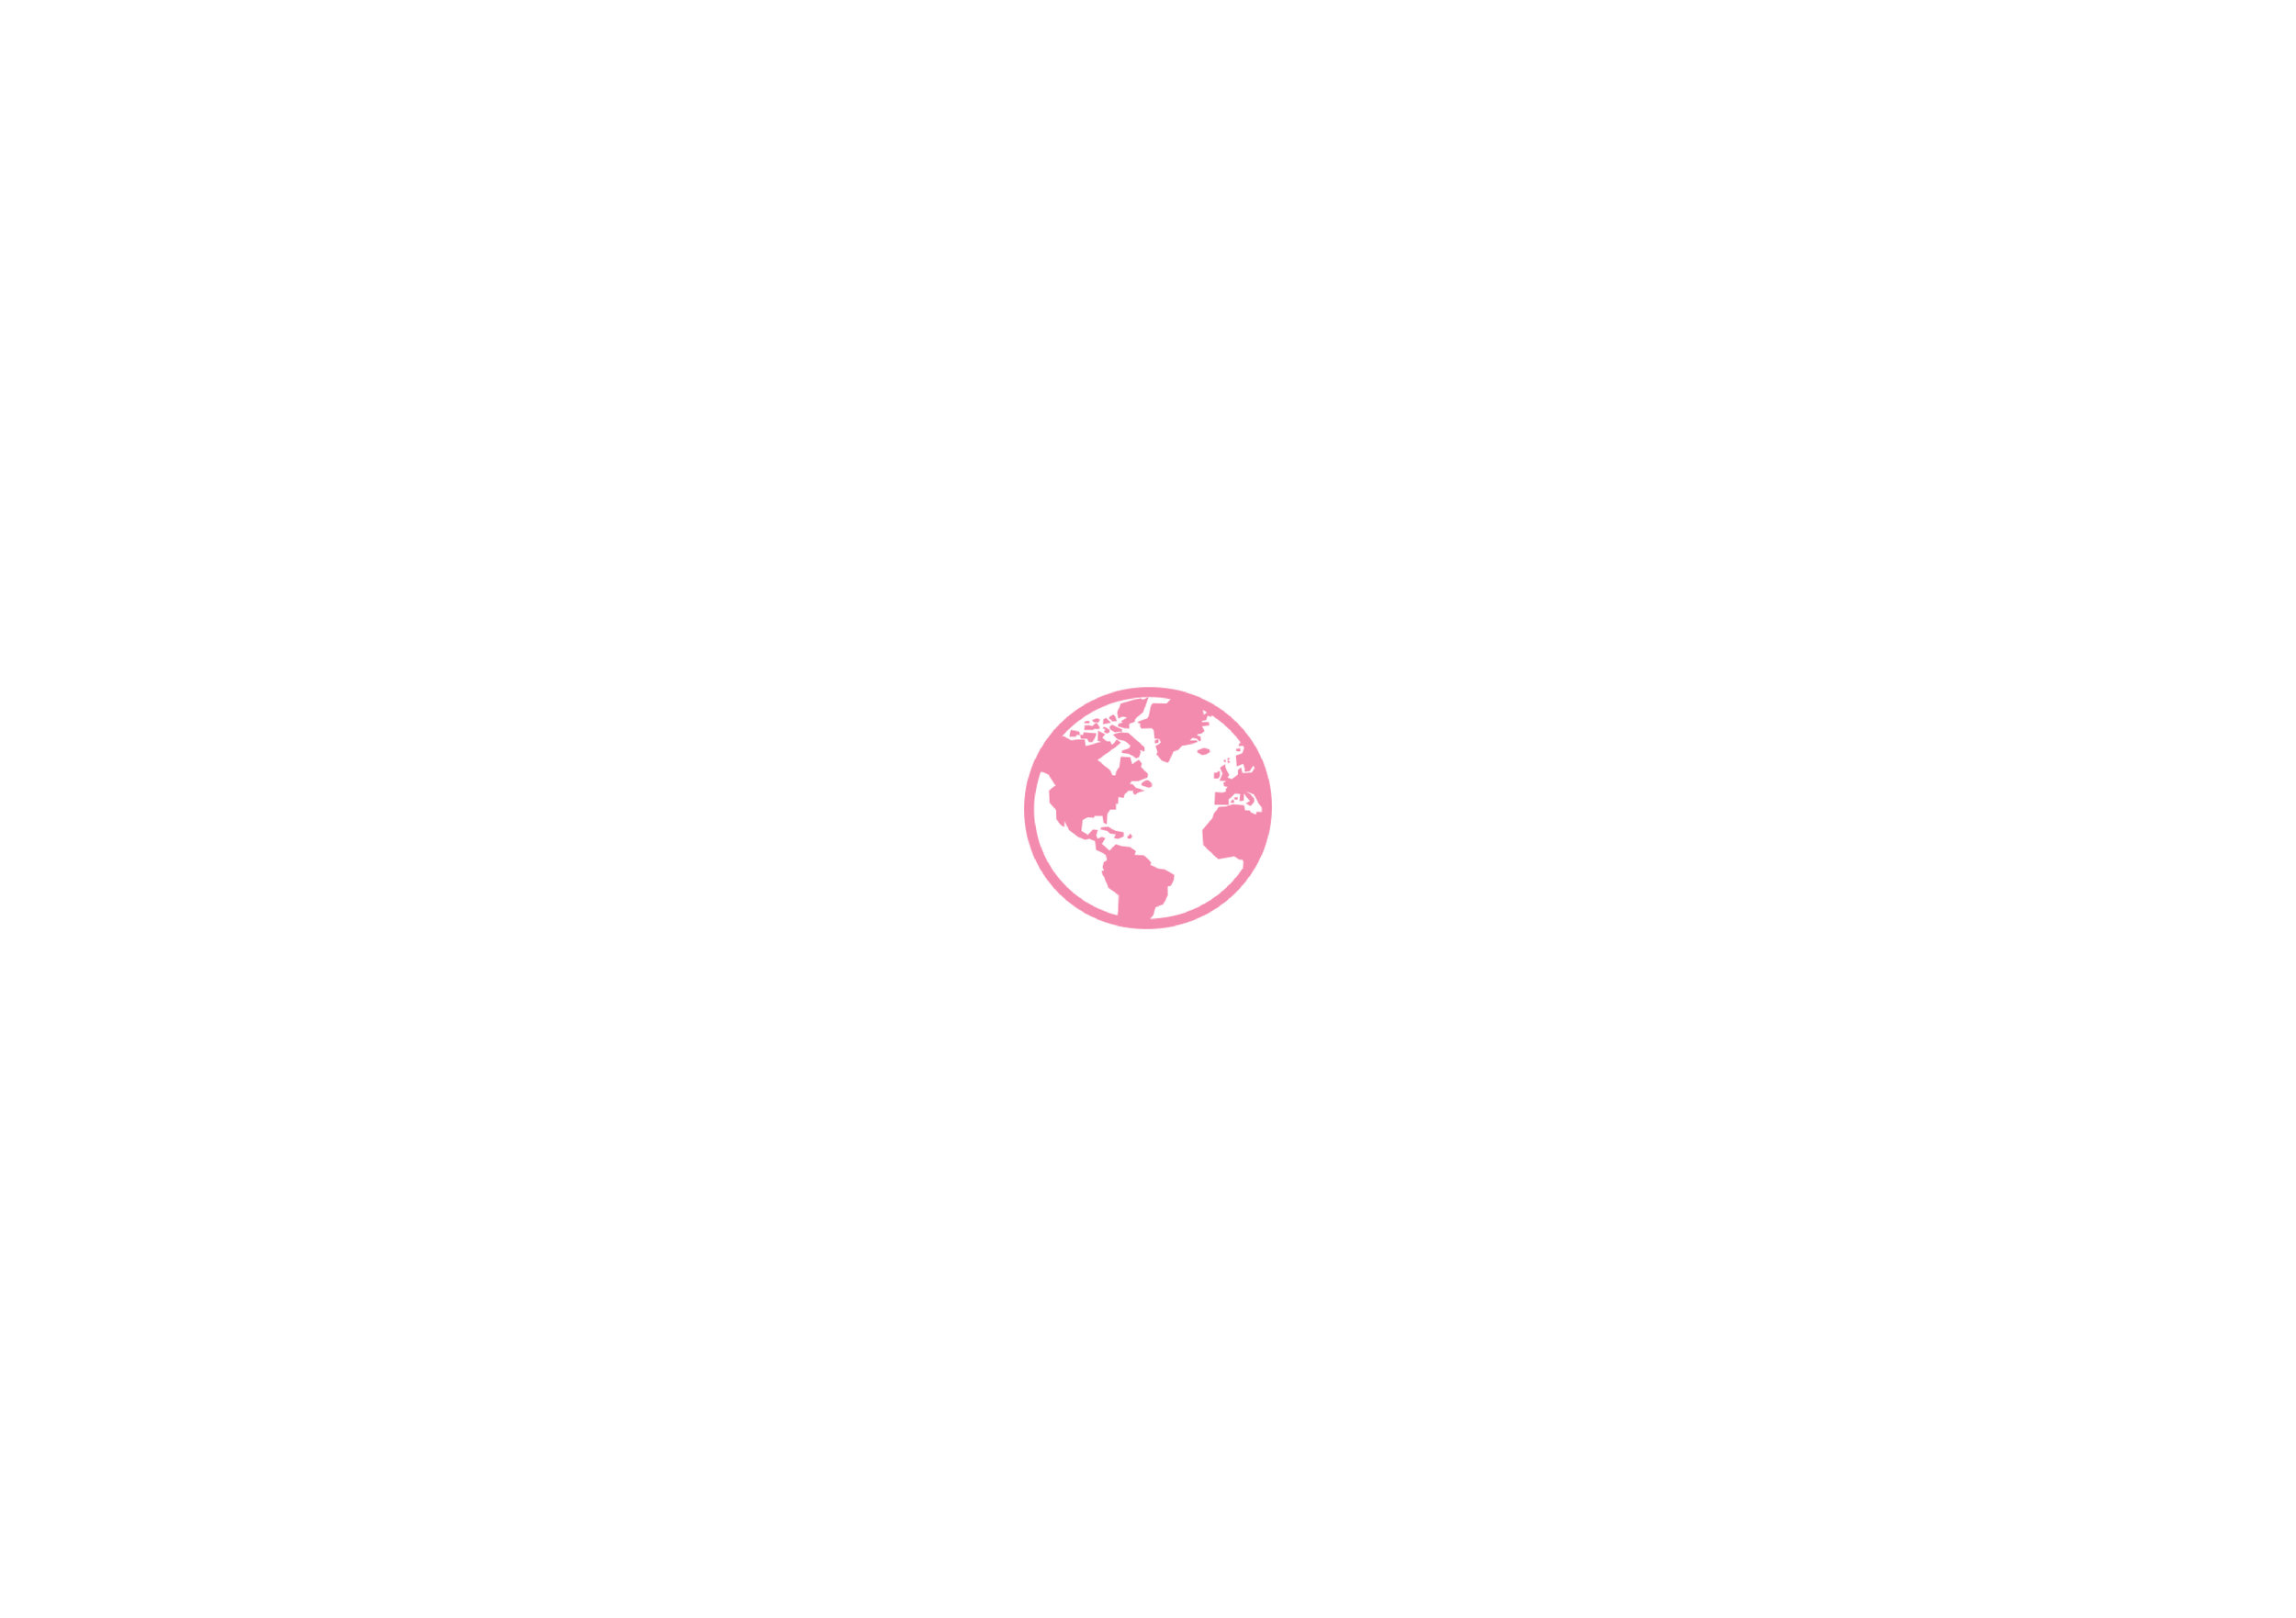 Planet_Pink.jpg